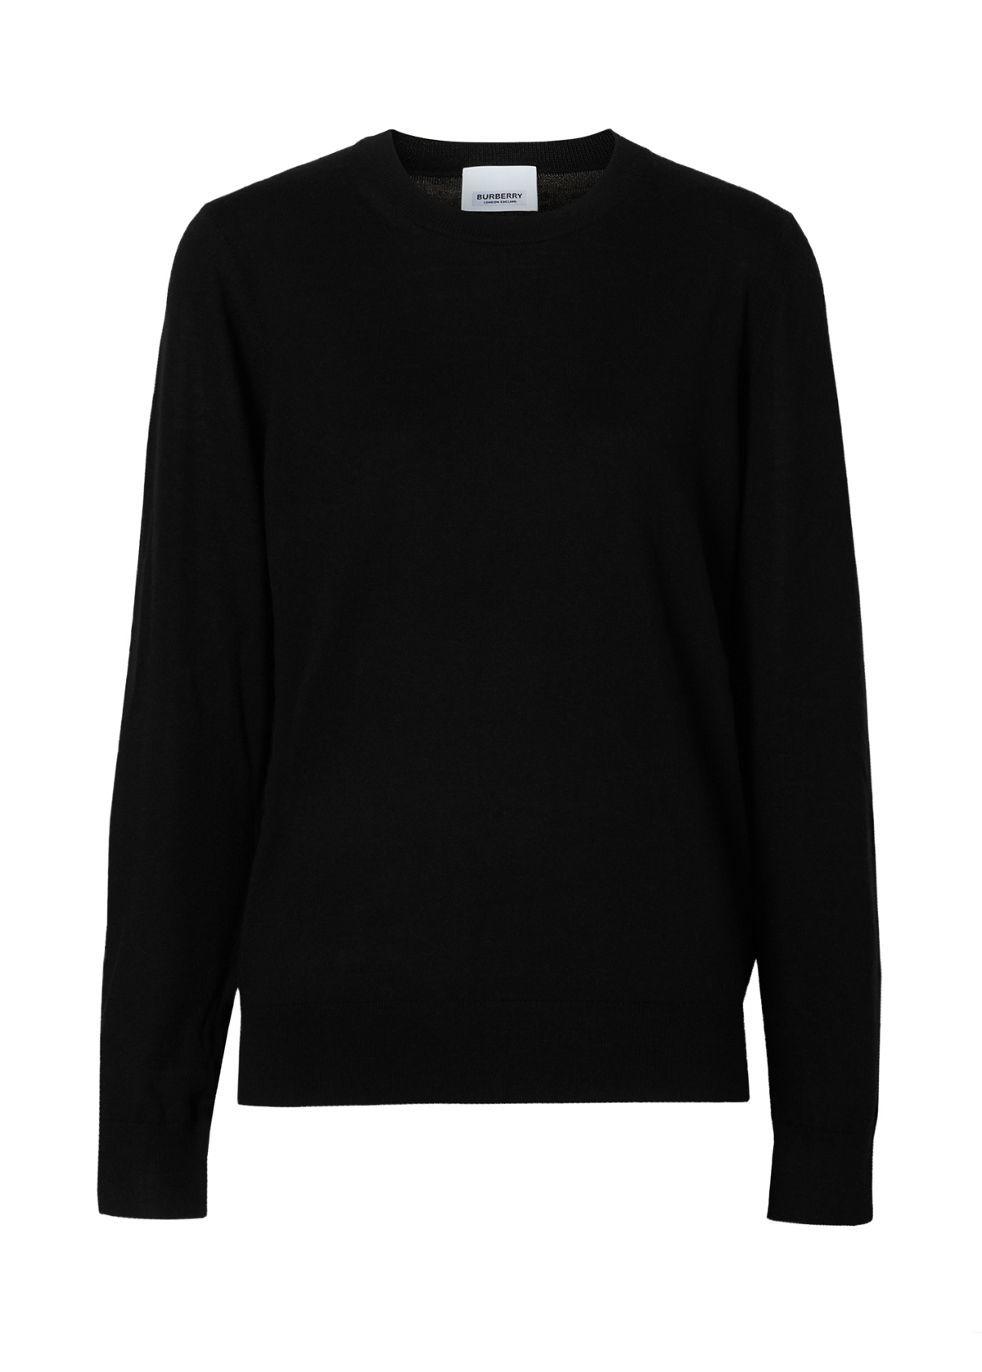 BURBERRY   Burberry Vintage Check Detail Merino Wool Sweater   Goxip